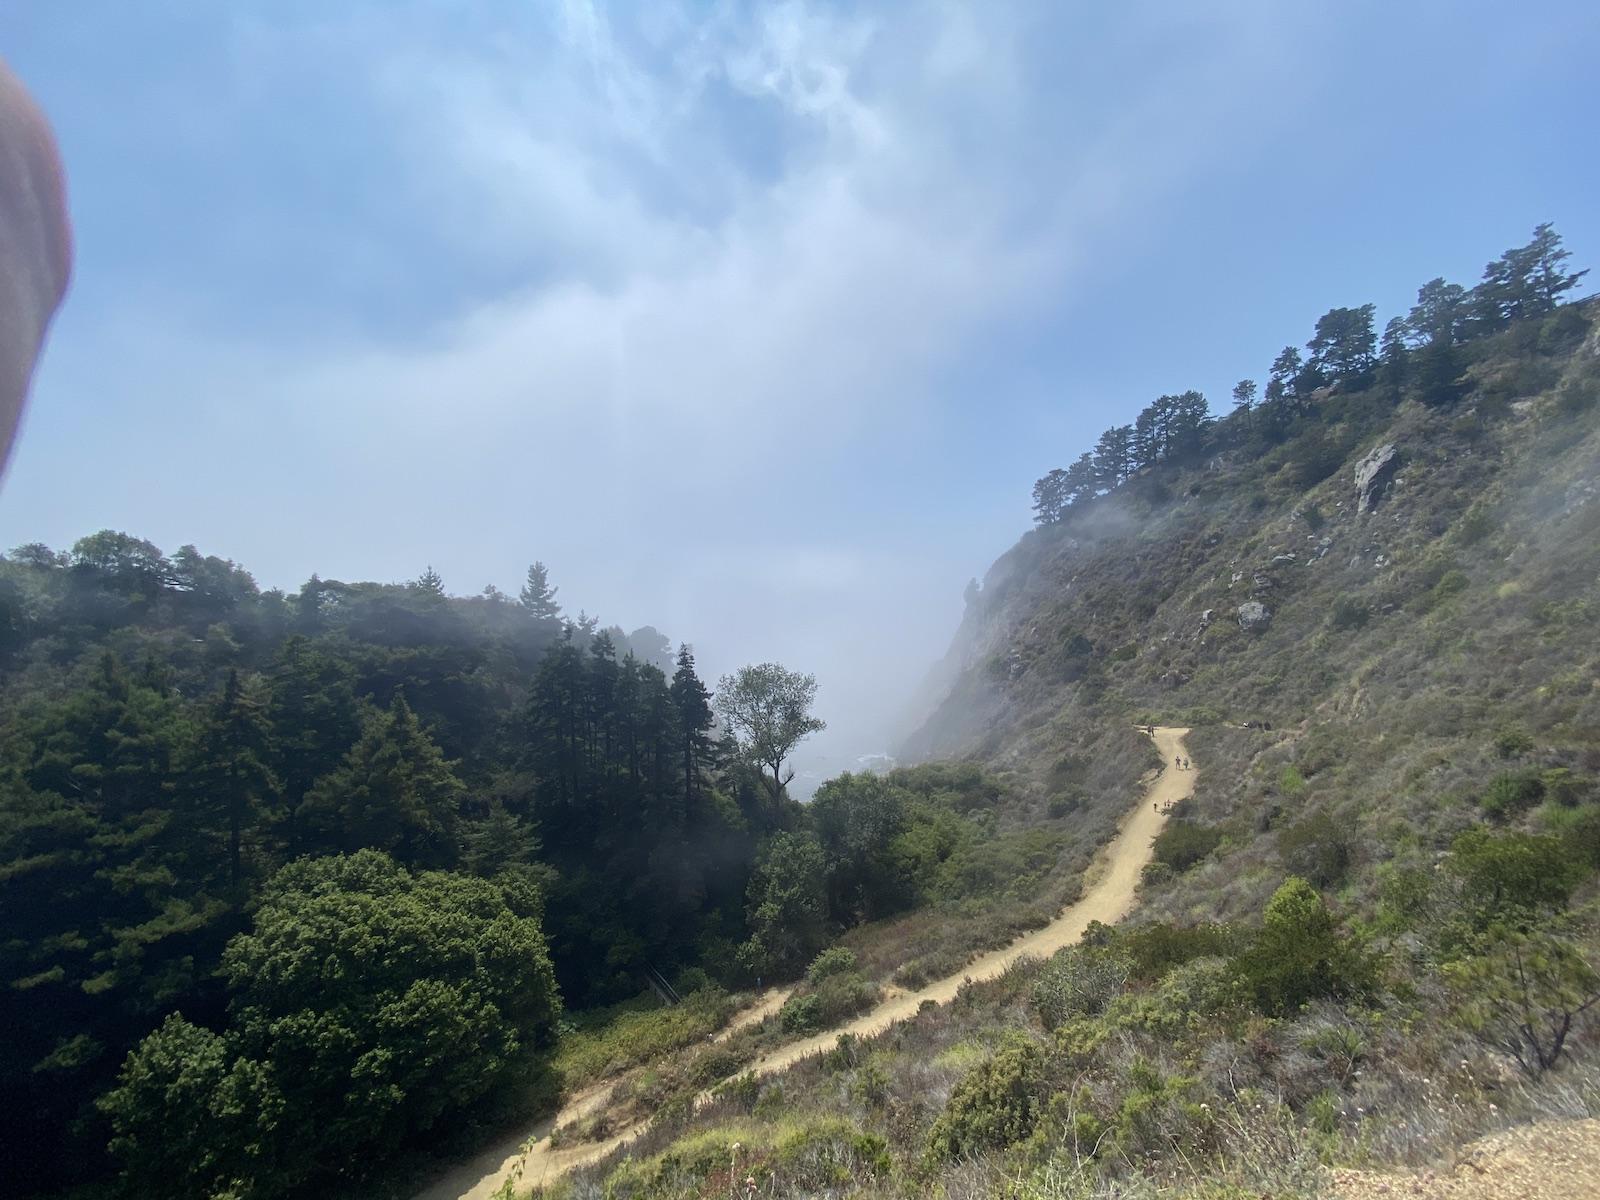 Hiking up Partington Canyon